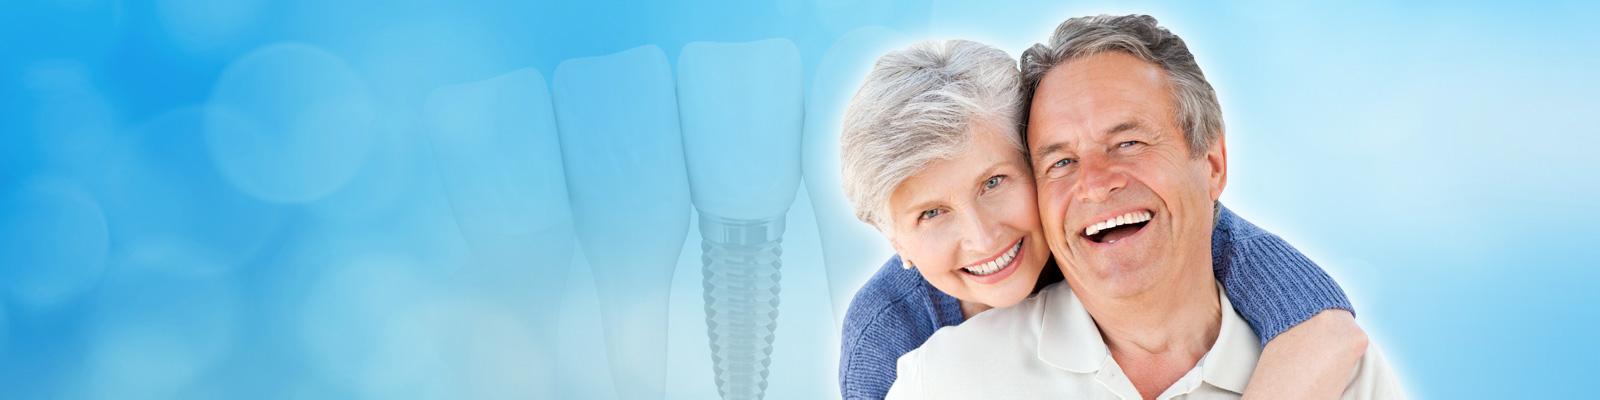 expert periodontics specialists homepage header banner